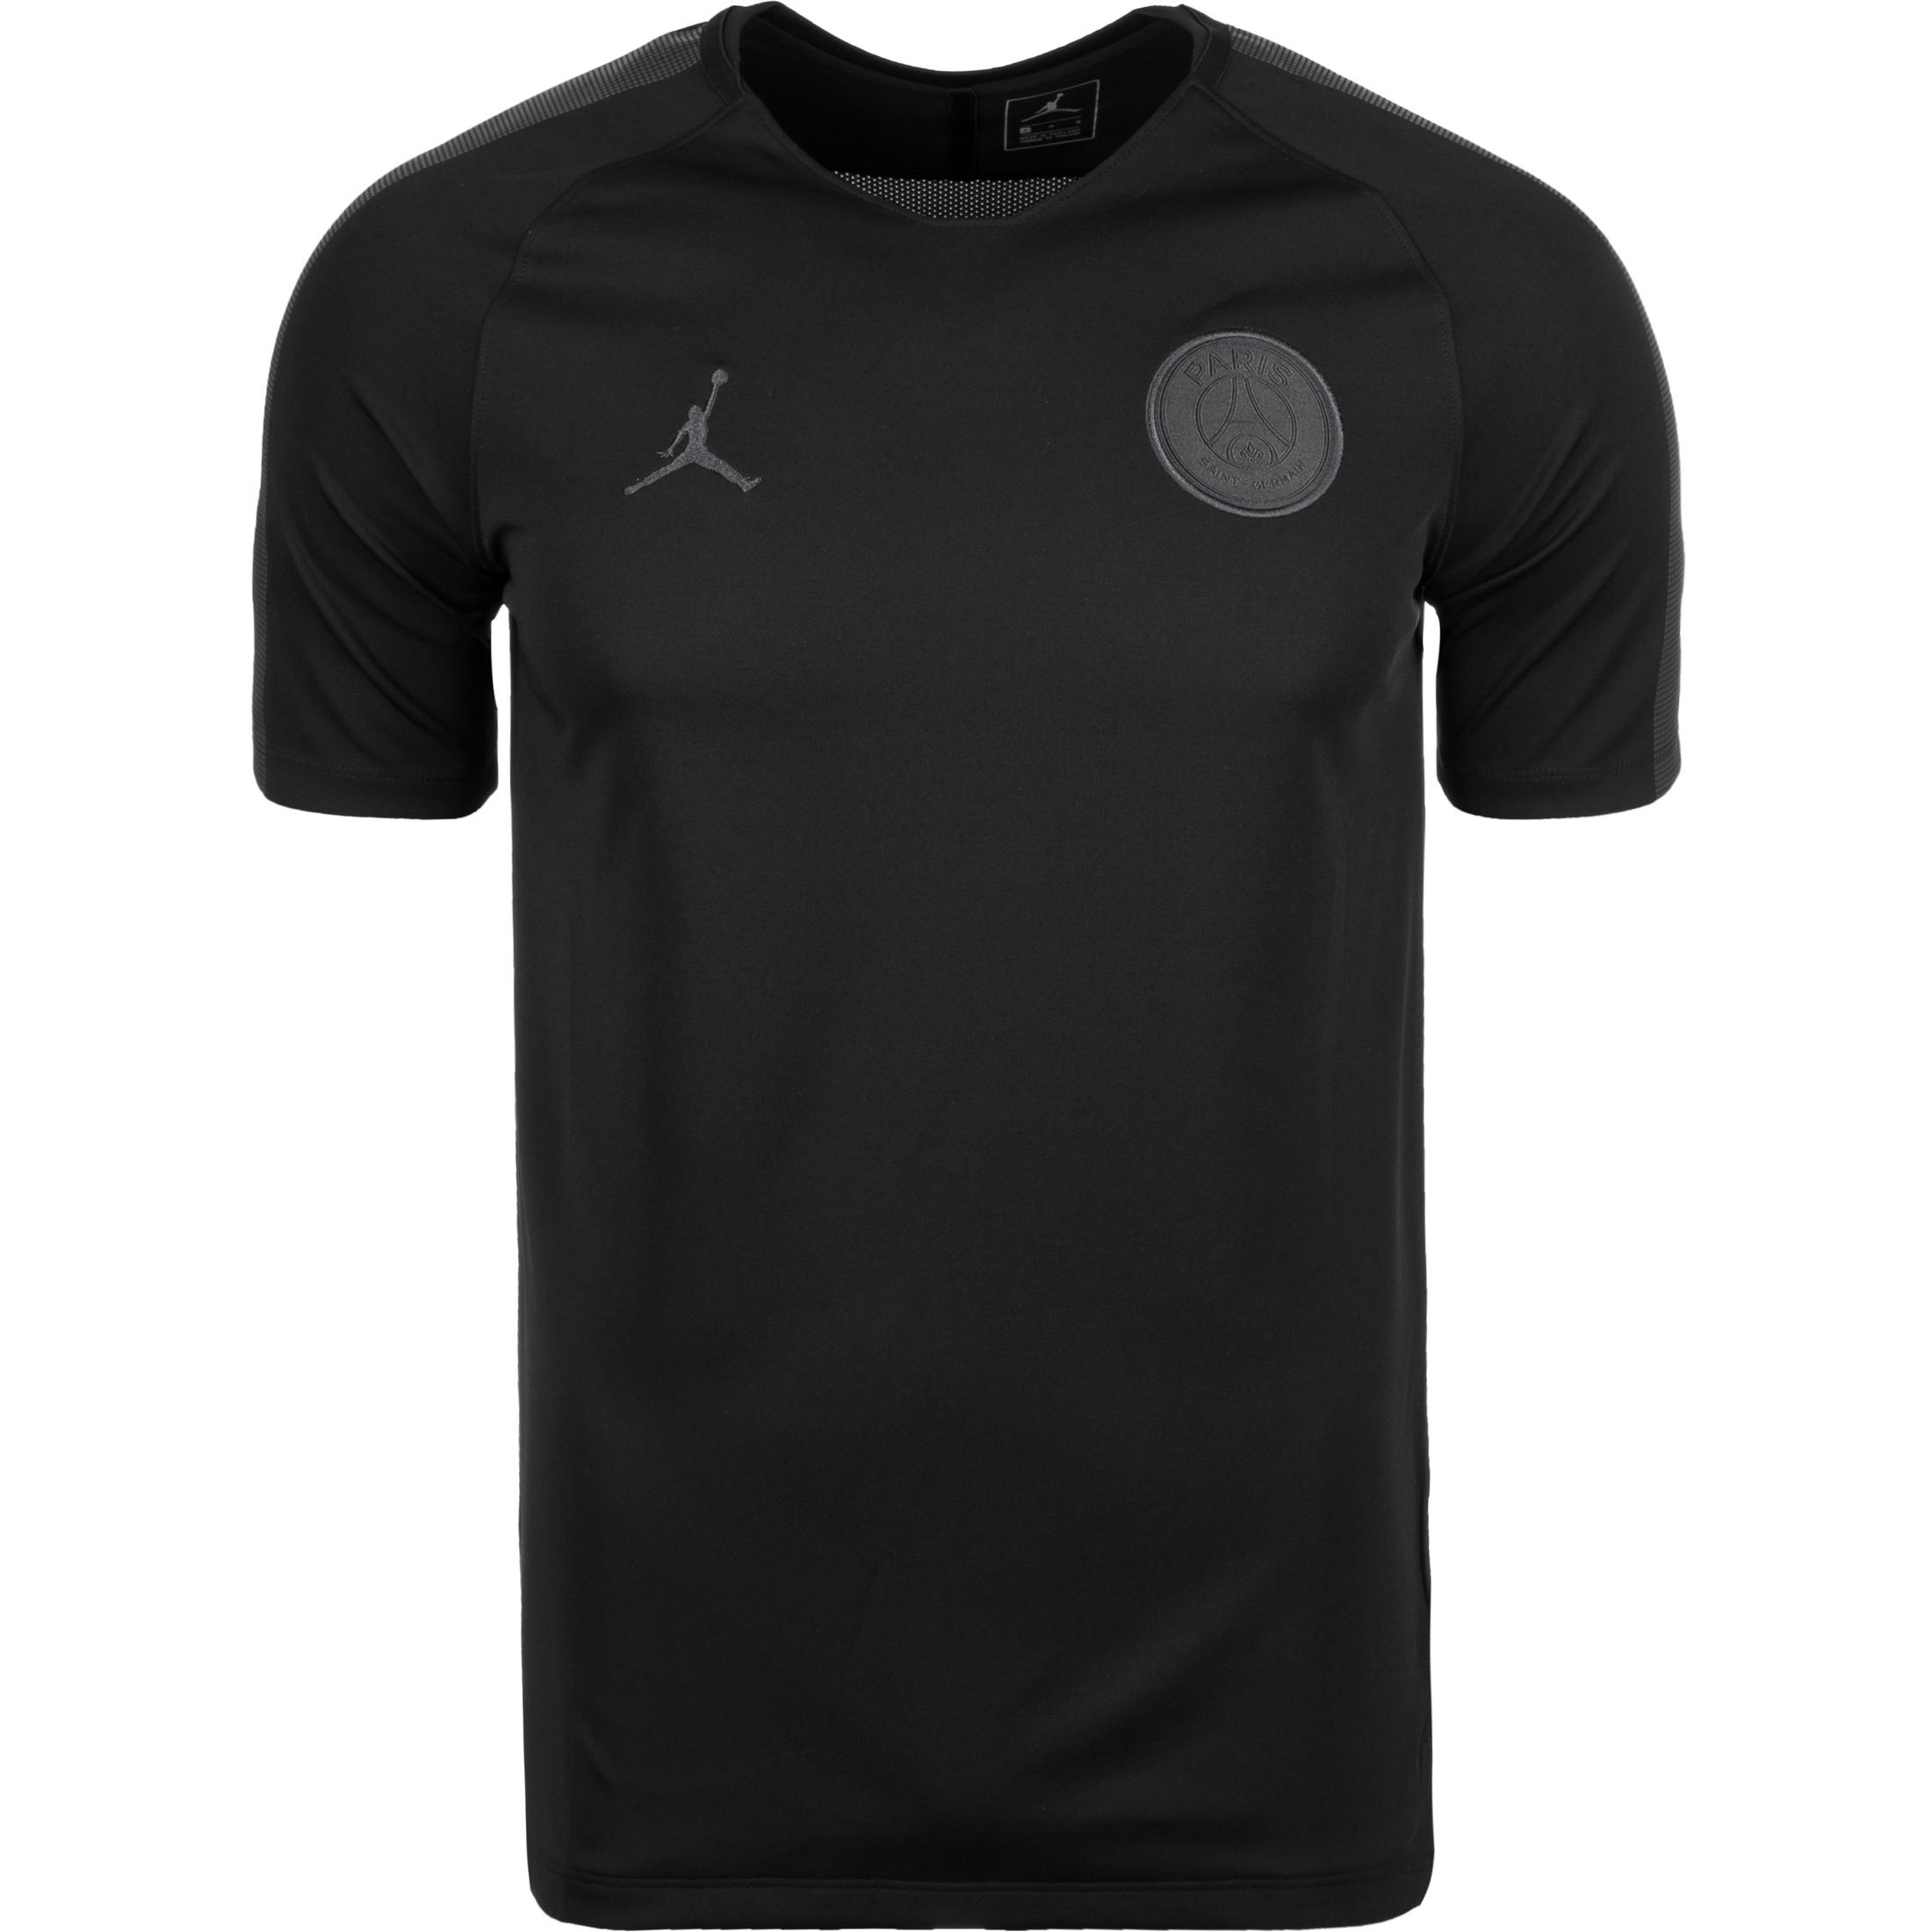 3b2ac1defb95 Nike Paris Saint-Germain Dri-FIT Breathe Squad Men s Short-Sleeve Football  Top - Black Jordan x PSG